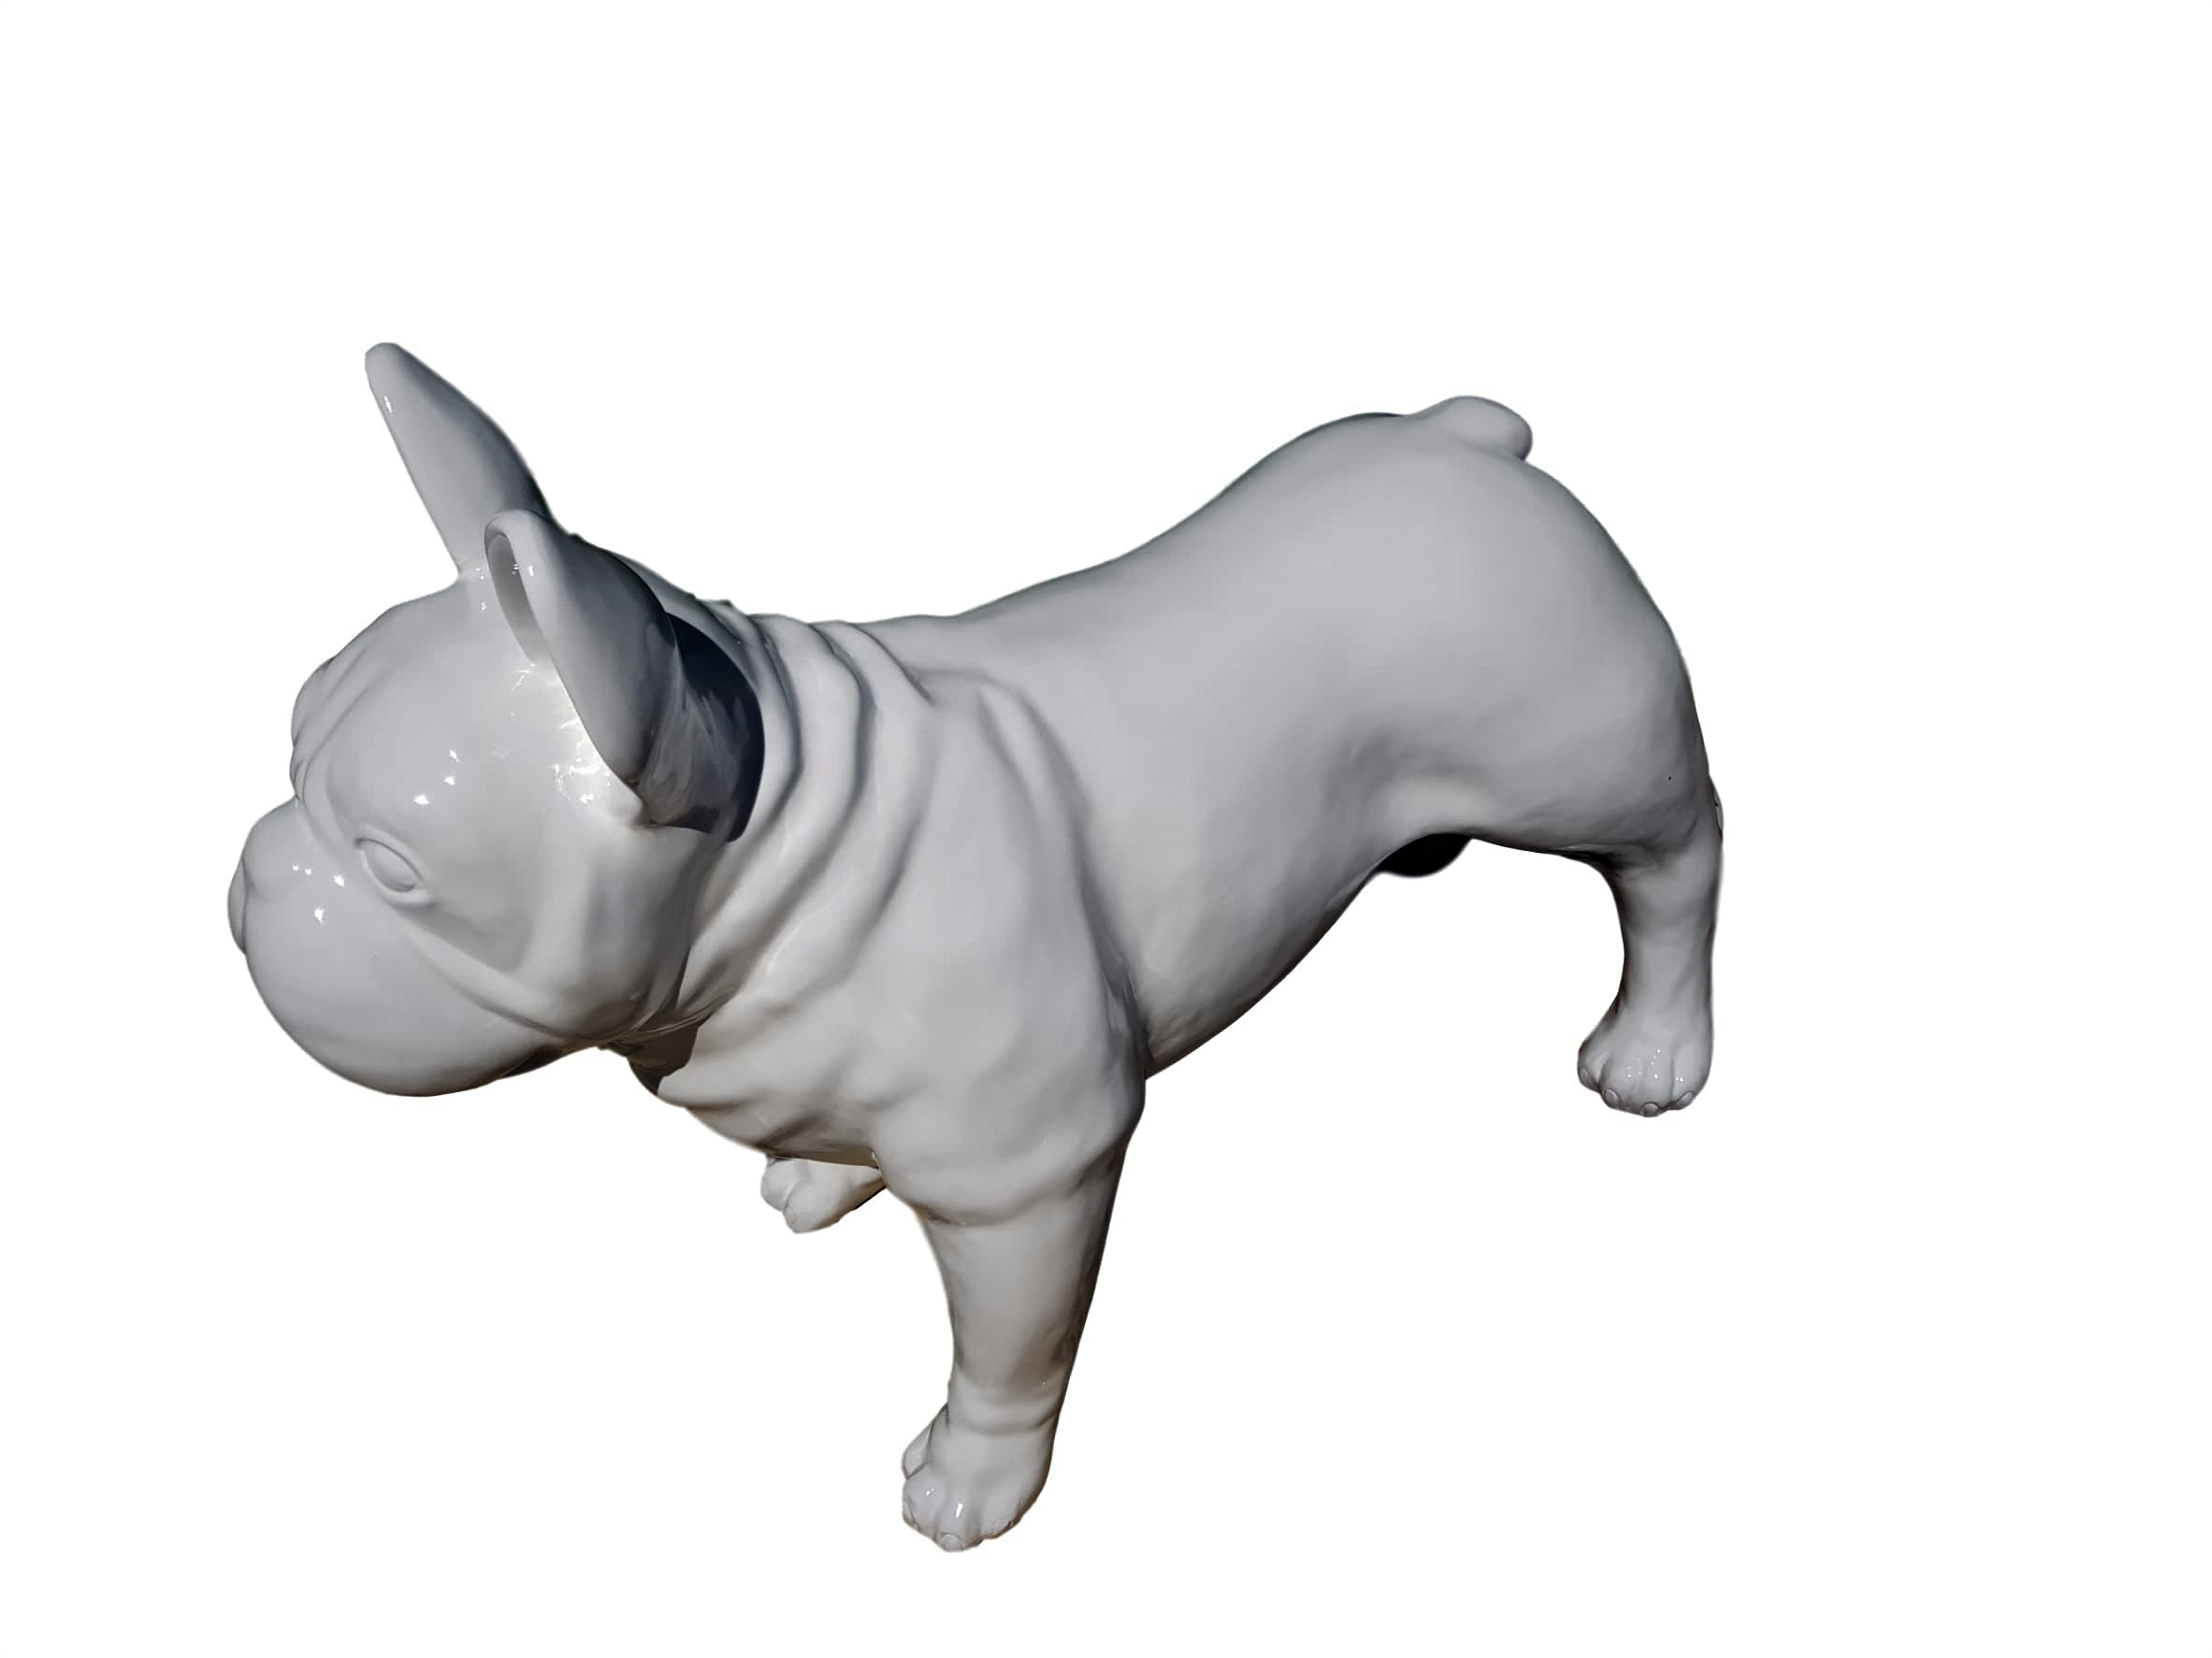 Figurka Ogrodowa Buldog Francuski Xxl Design 6925955813 Allegro Pl